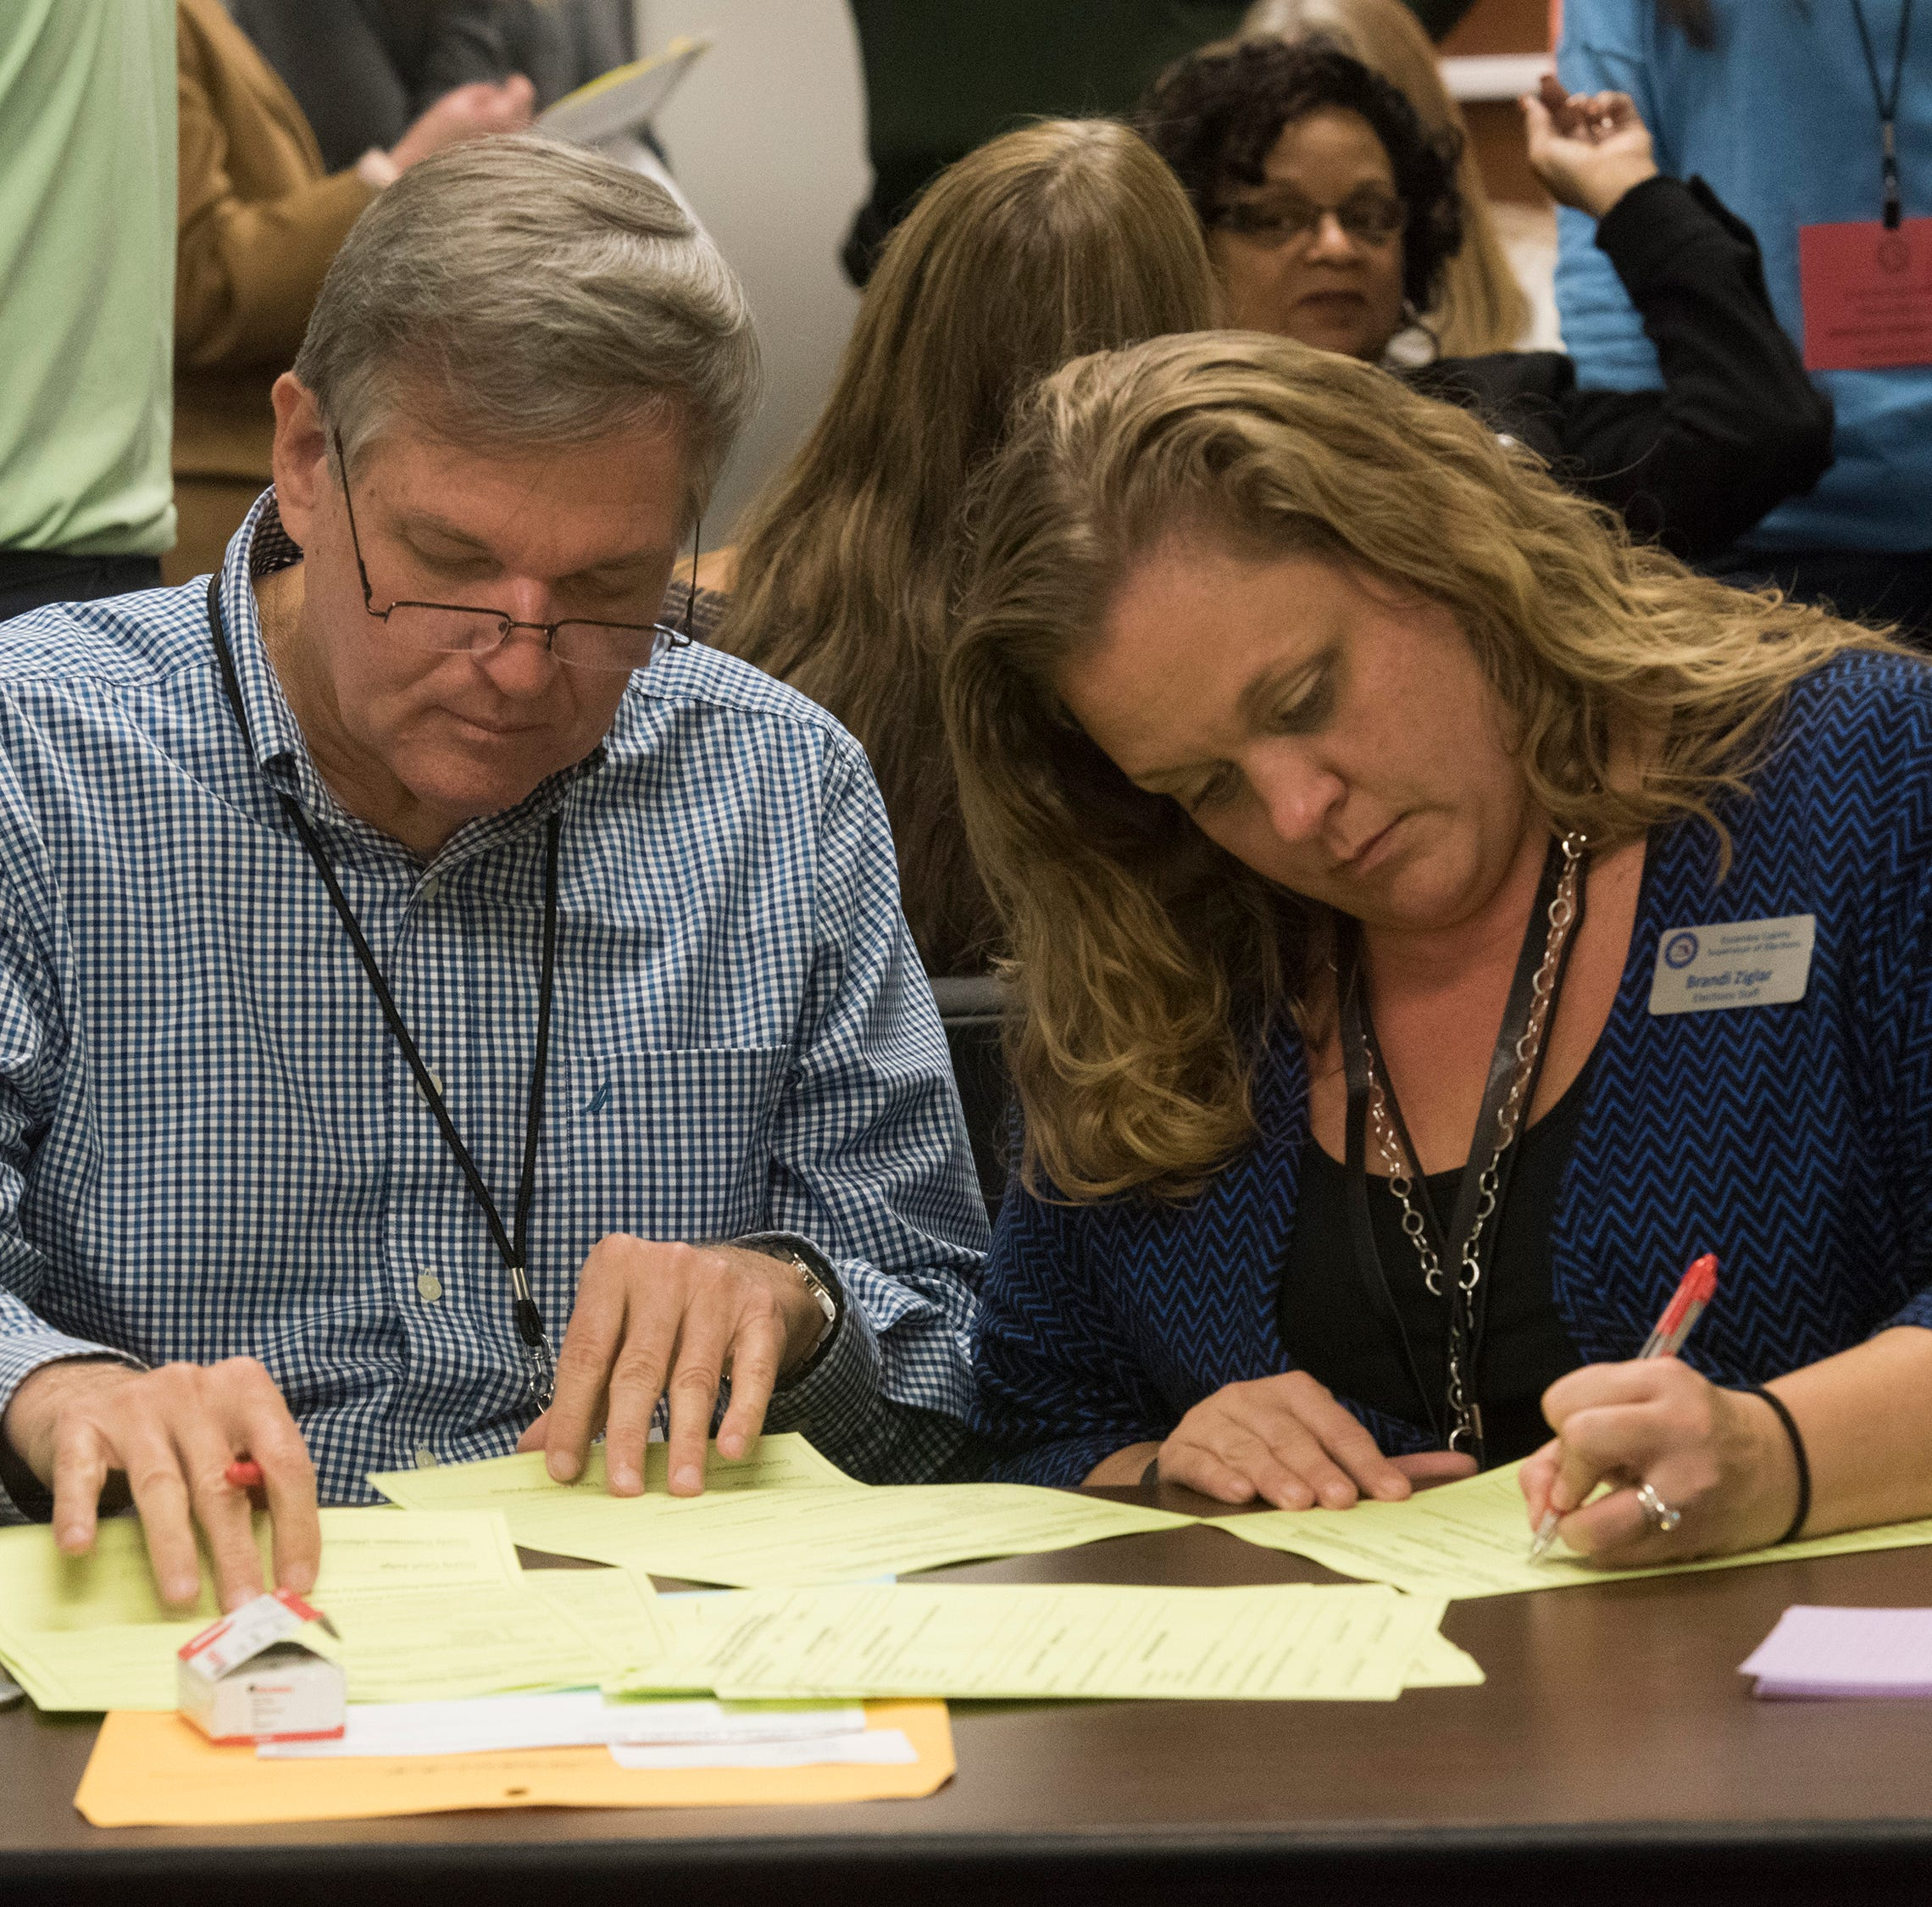 Manual recount complete in Santa Rosa County, will continue in Escambia County